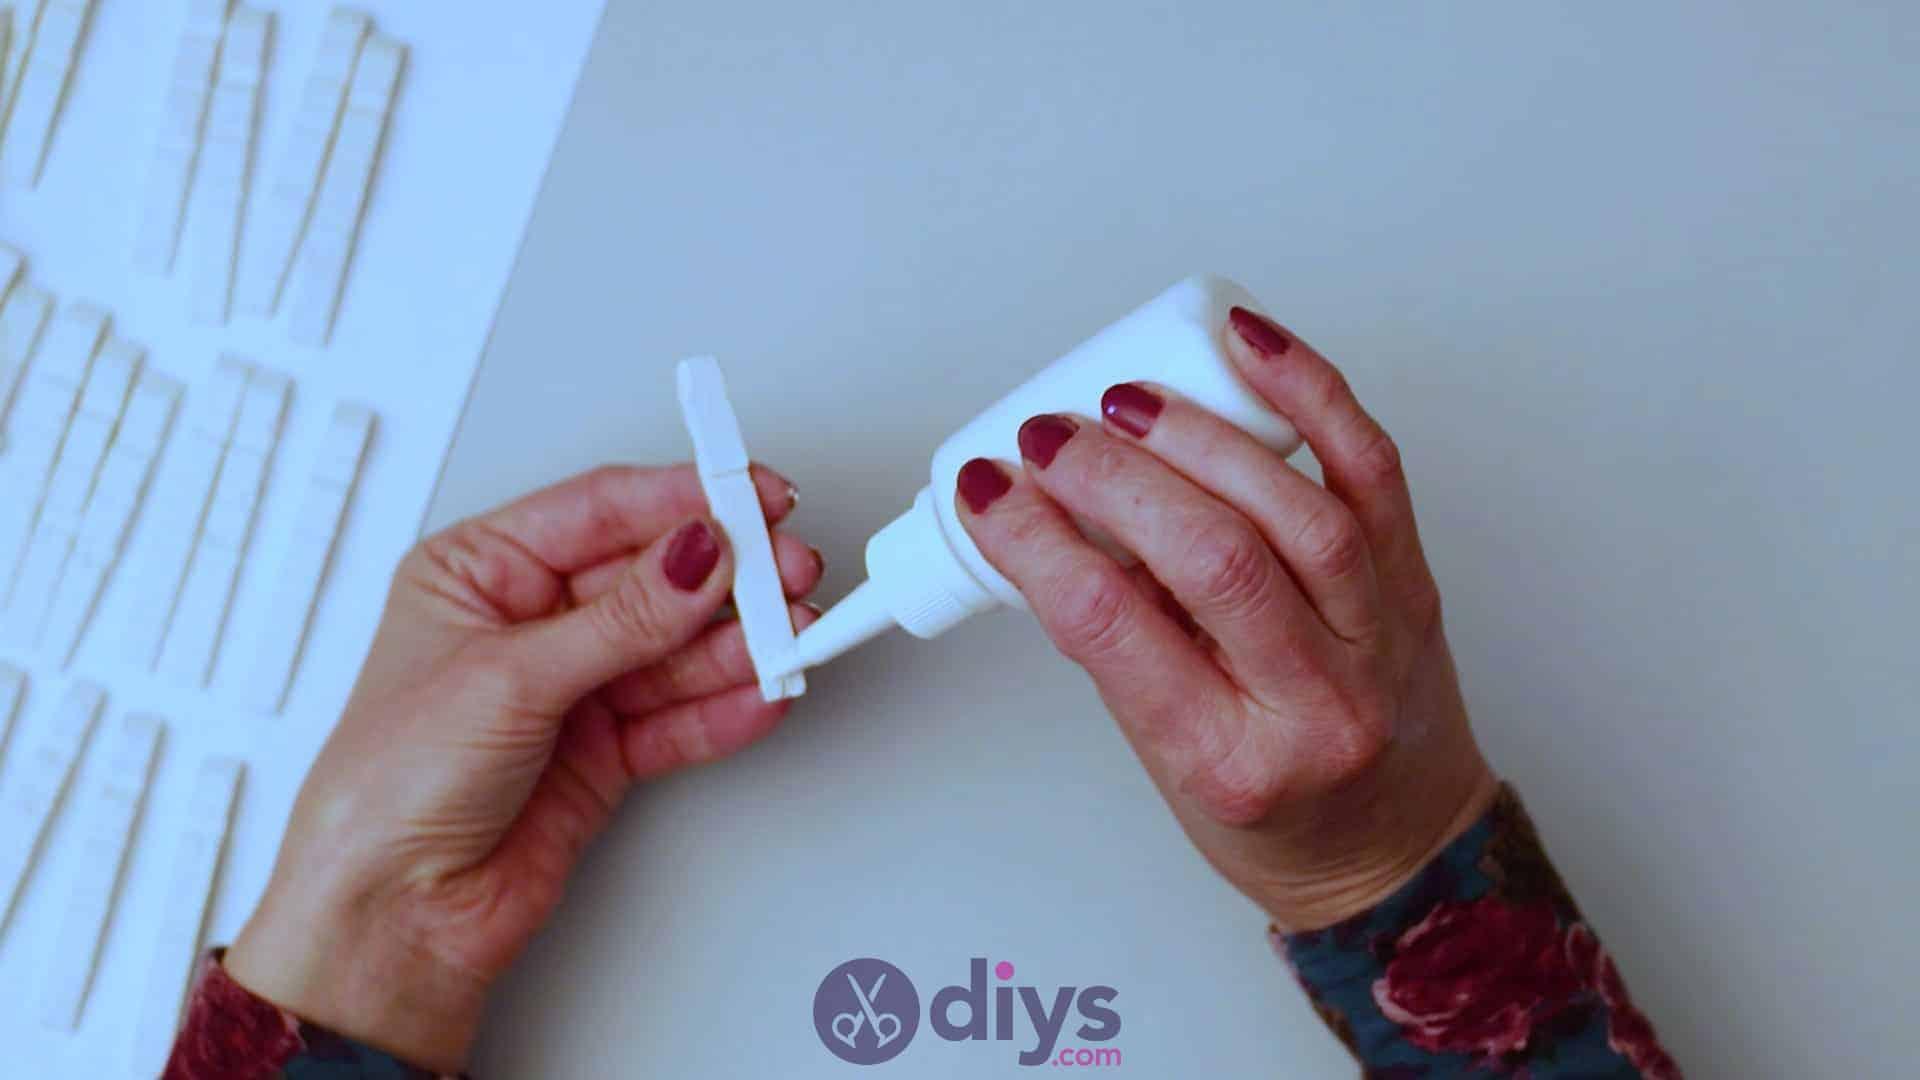 Diy clothespin napkin holder step 4